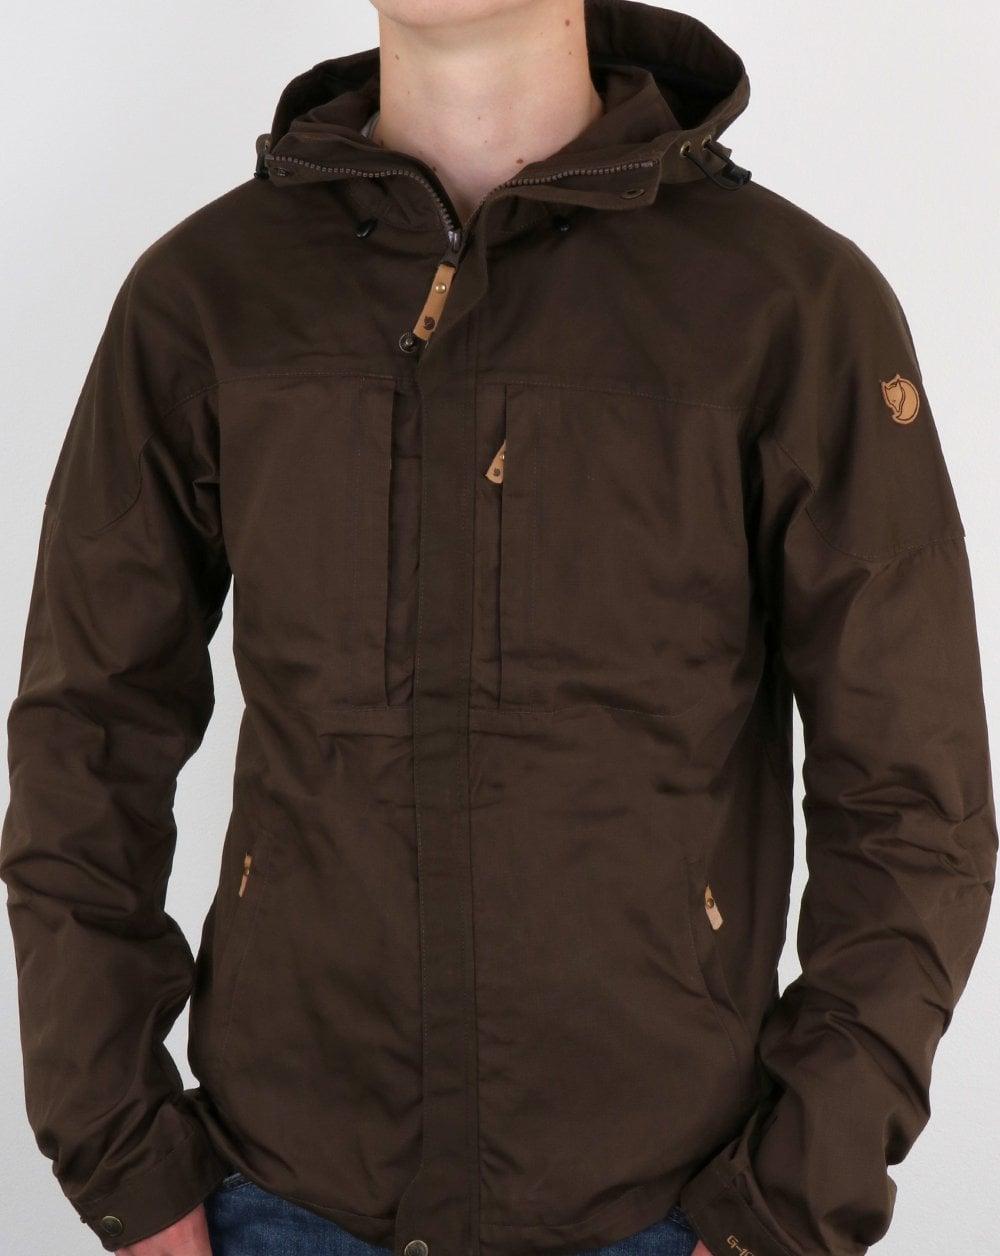 Fjallraven Skogso Jacket Dark Olive Hooded Parka Coat Rain